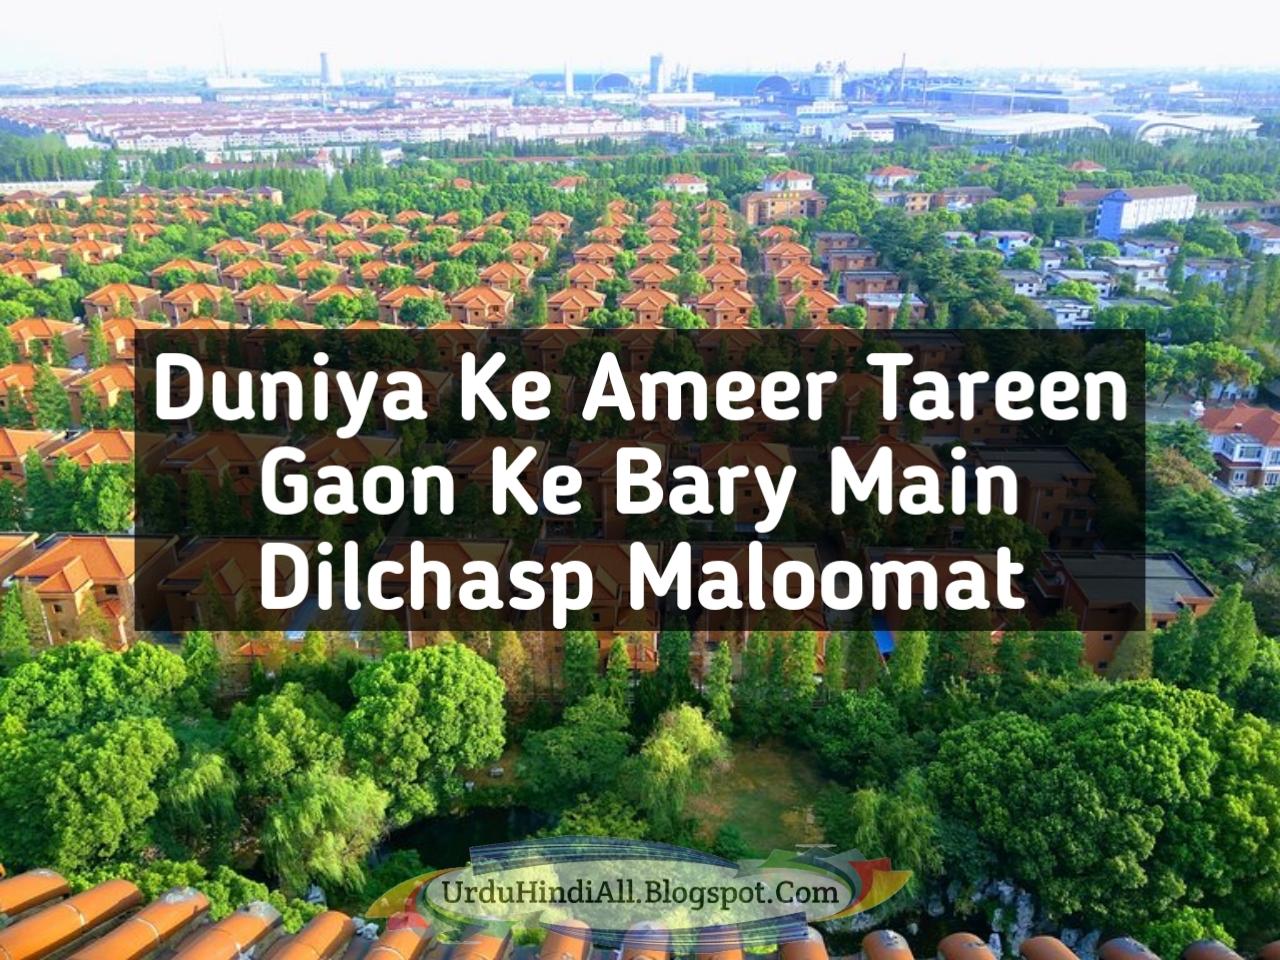 The-Richest-Village-In-The-World-Urdu-Hindi-dilchasp-maloomat